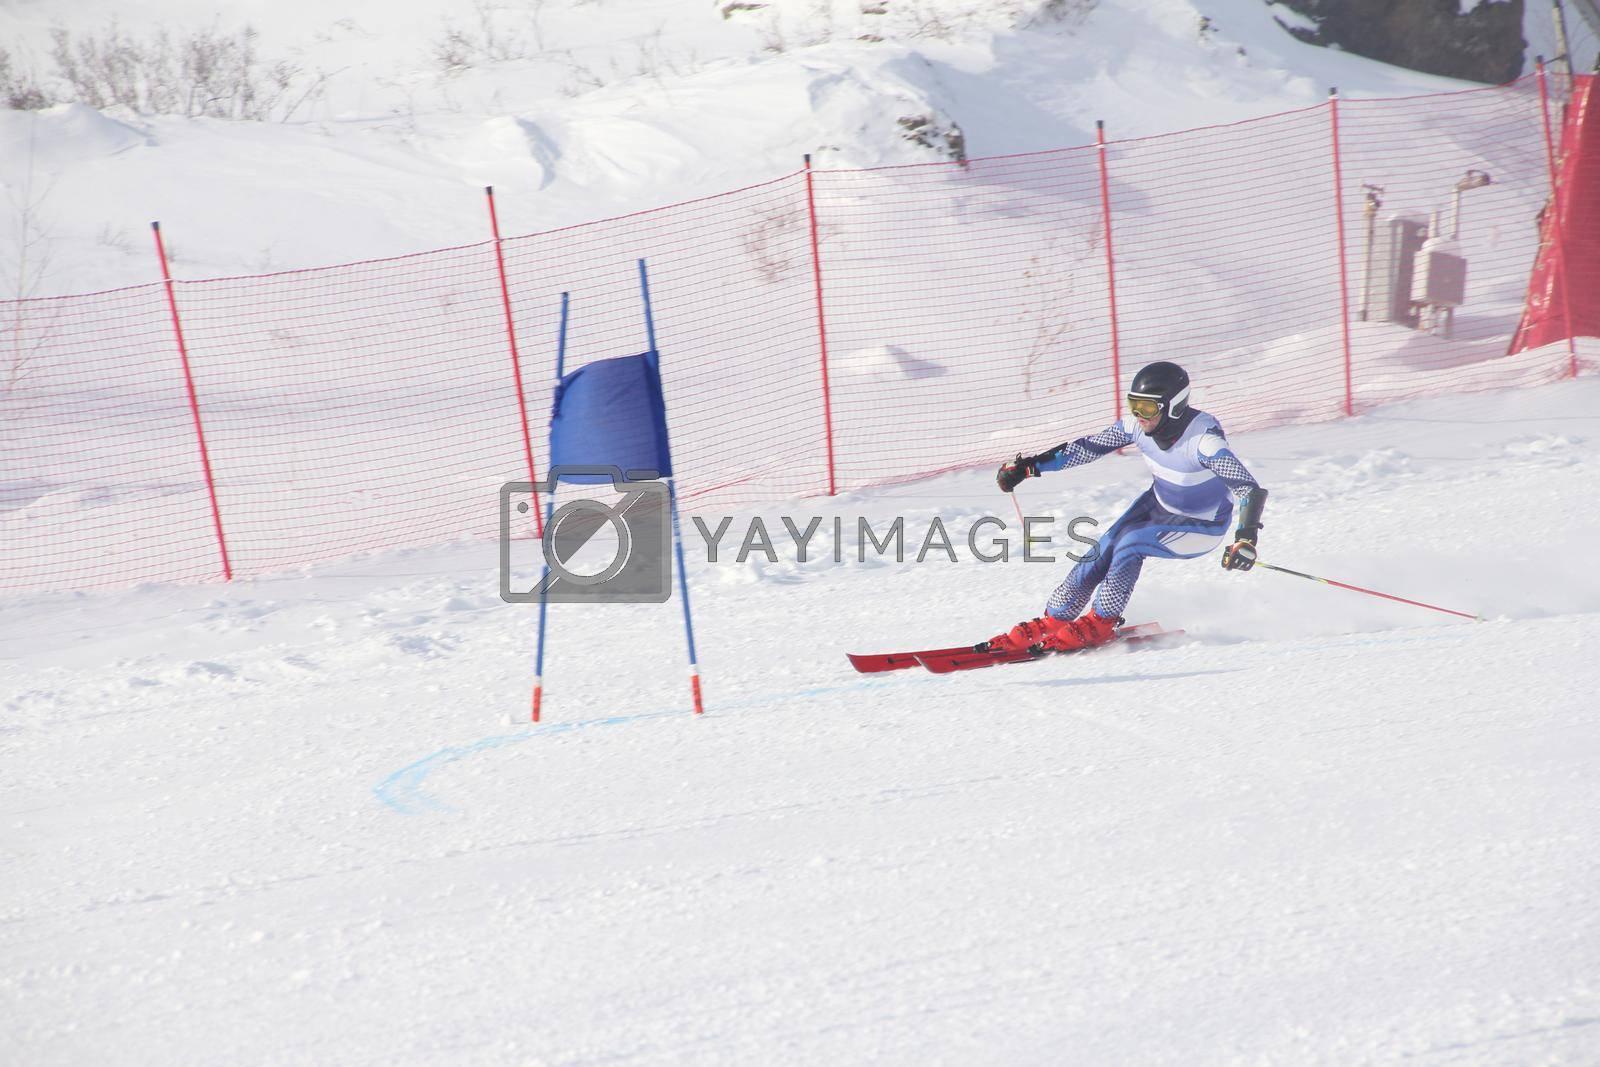 Super G race, alpine skier attack ski gate competition